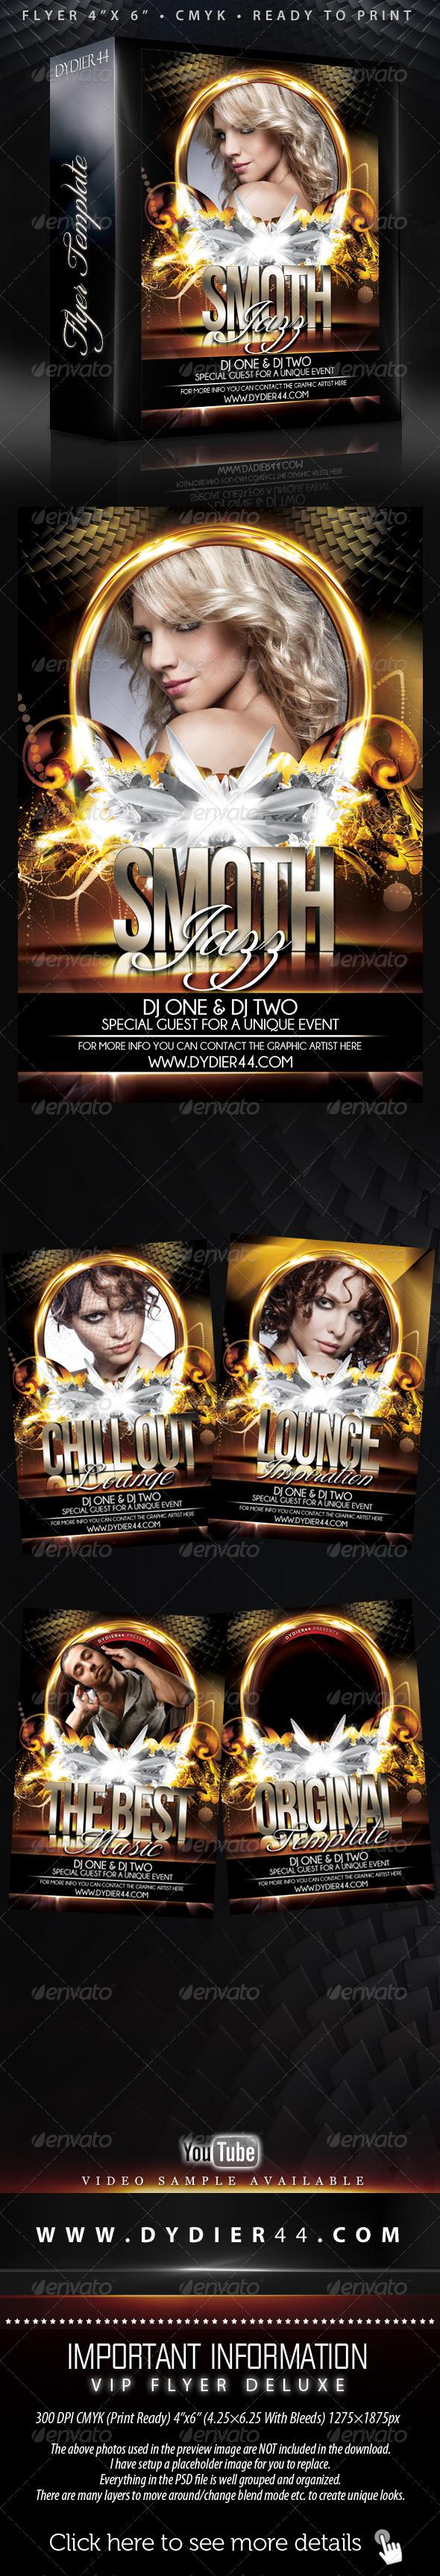 GraphicRiver Night Club II Flyer Template 4x6 398422